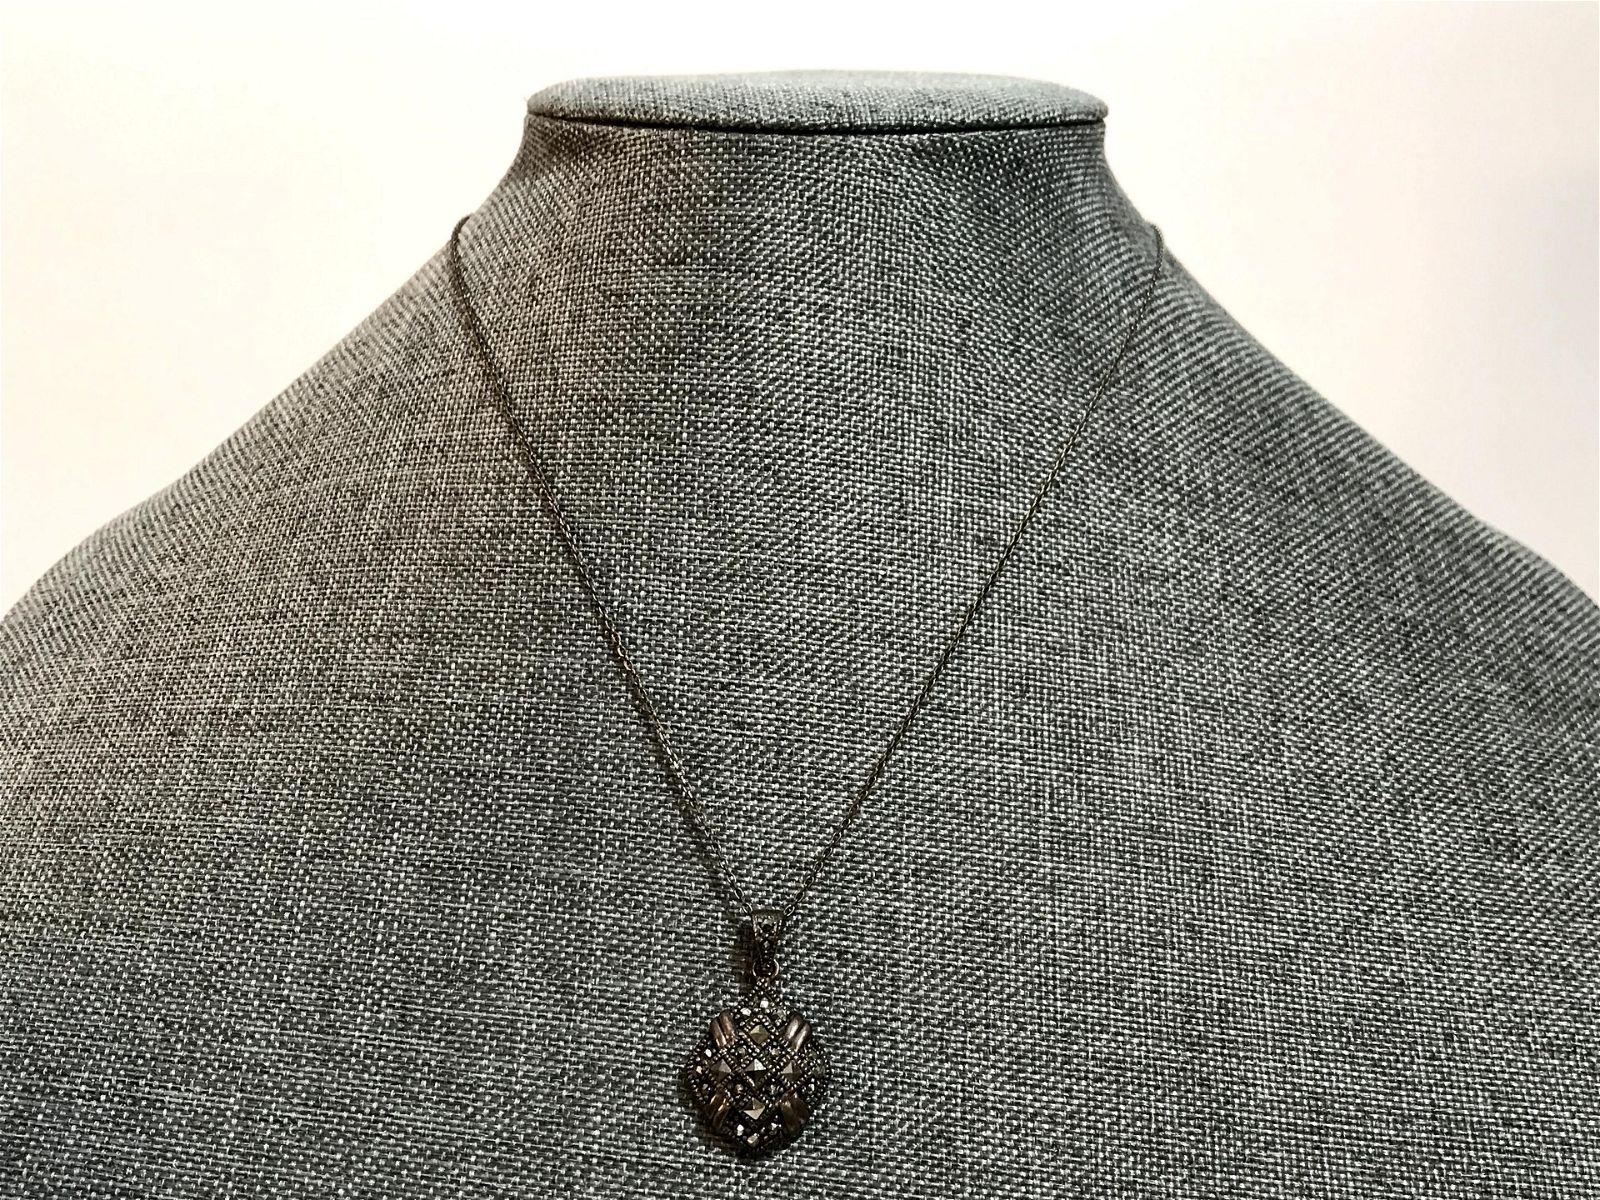 Vintage Sterling Silver Marcasite Pendant Necklace